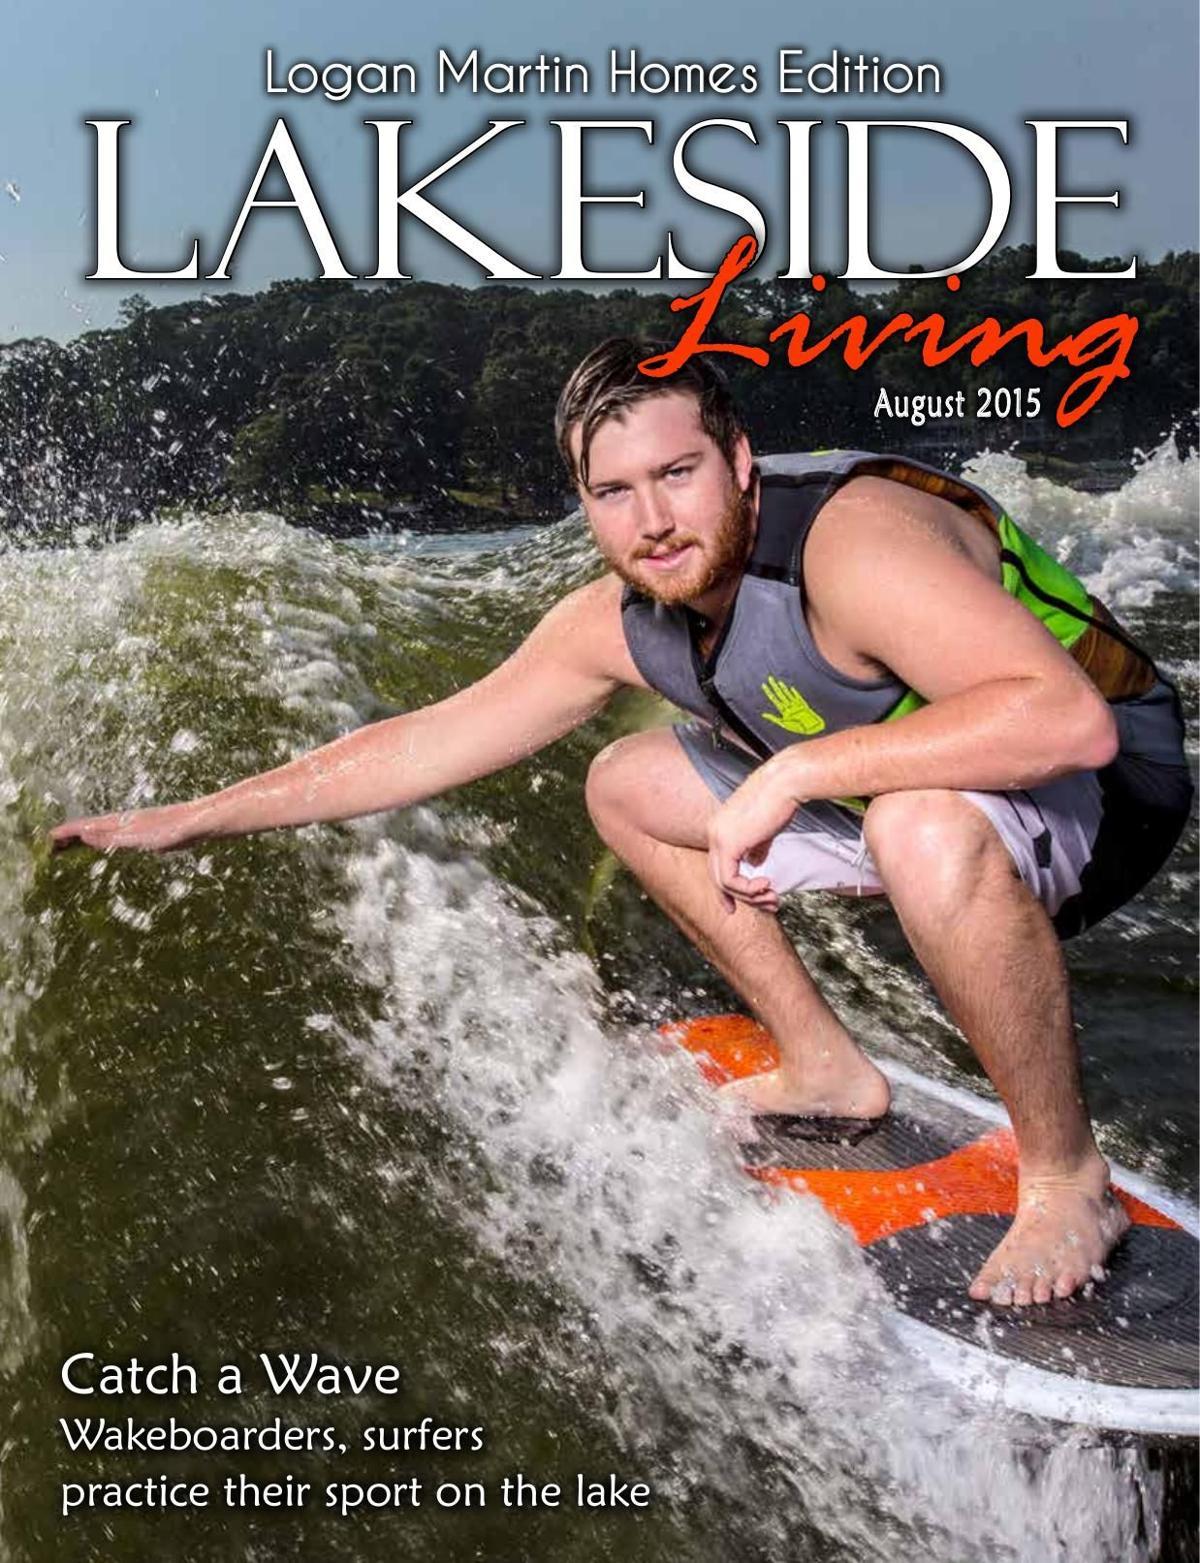 Lakeside - August 2015